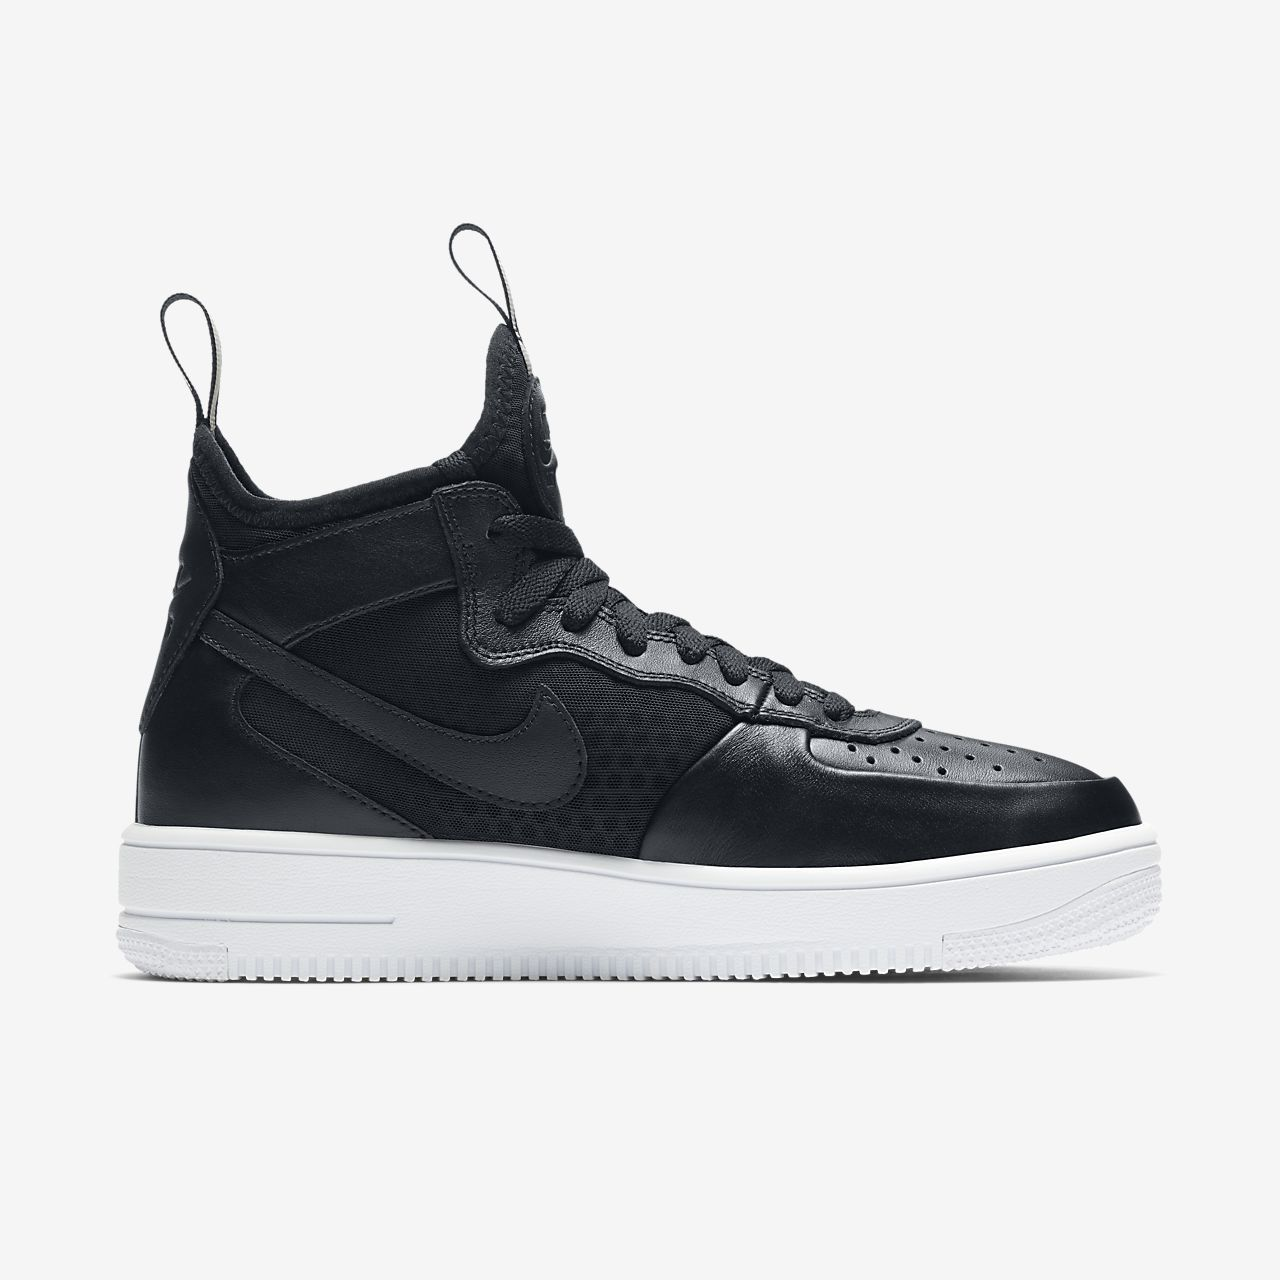 ... Nike Air Force 1 UltraForce női cipő